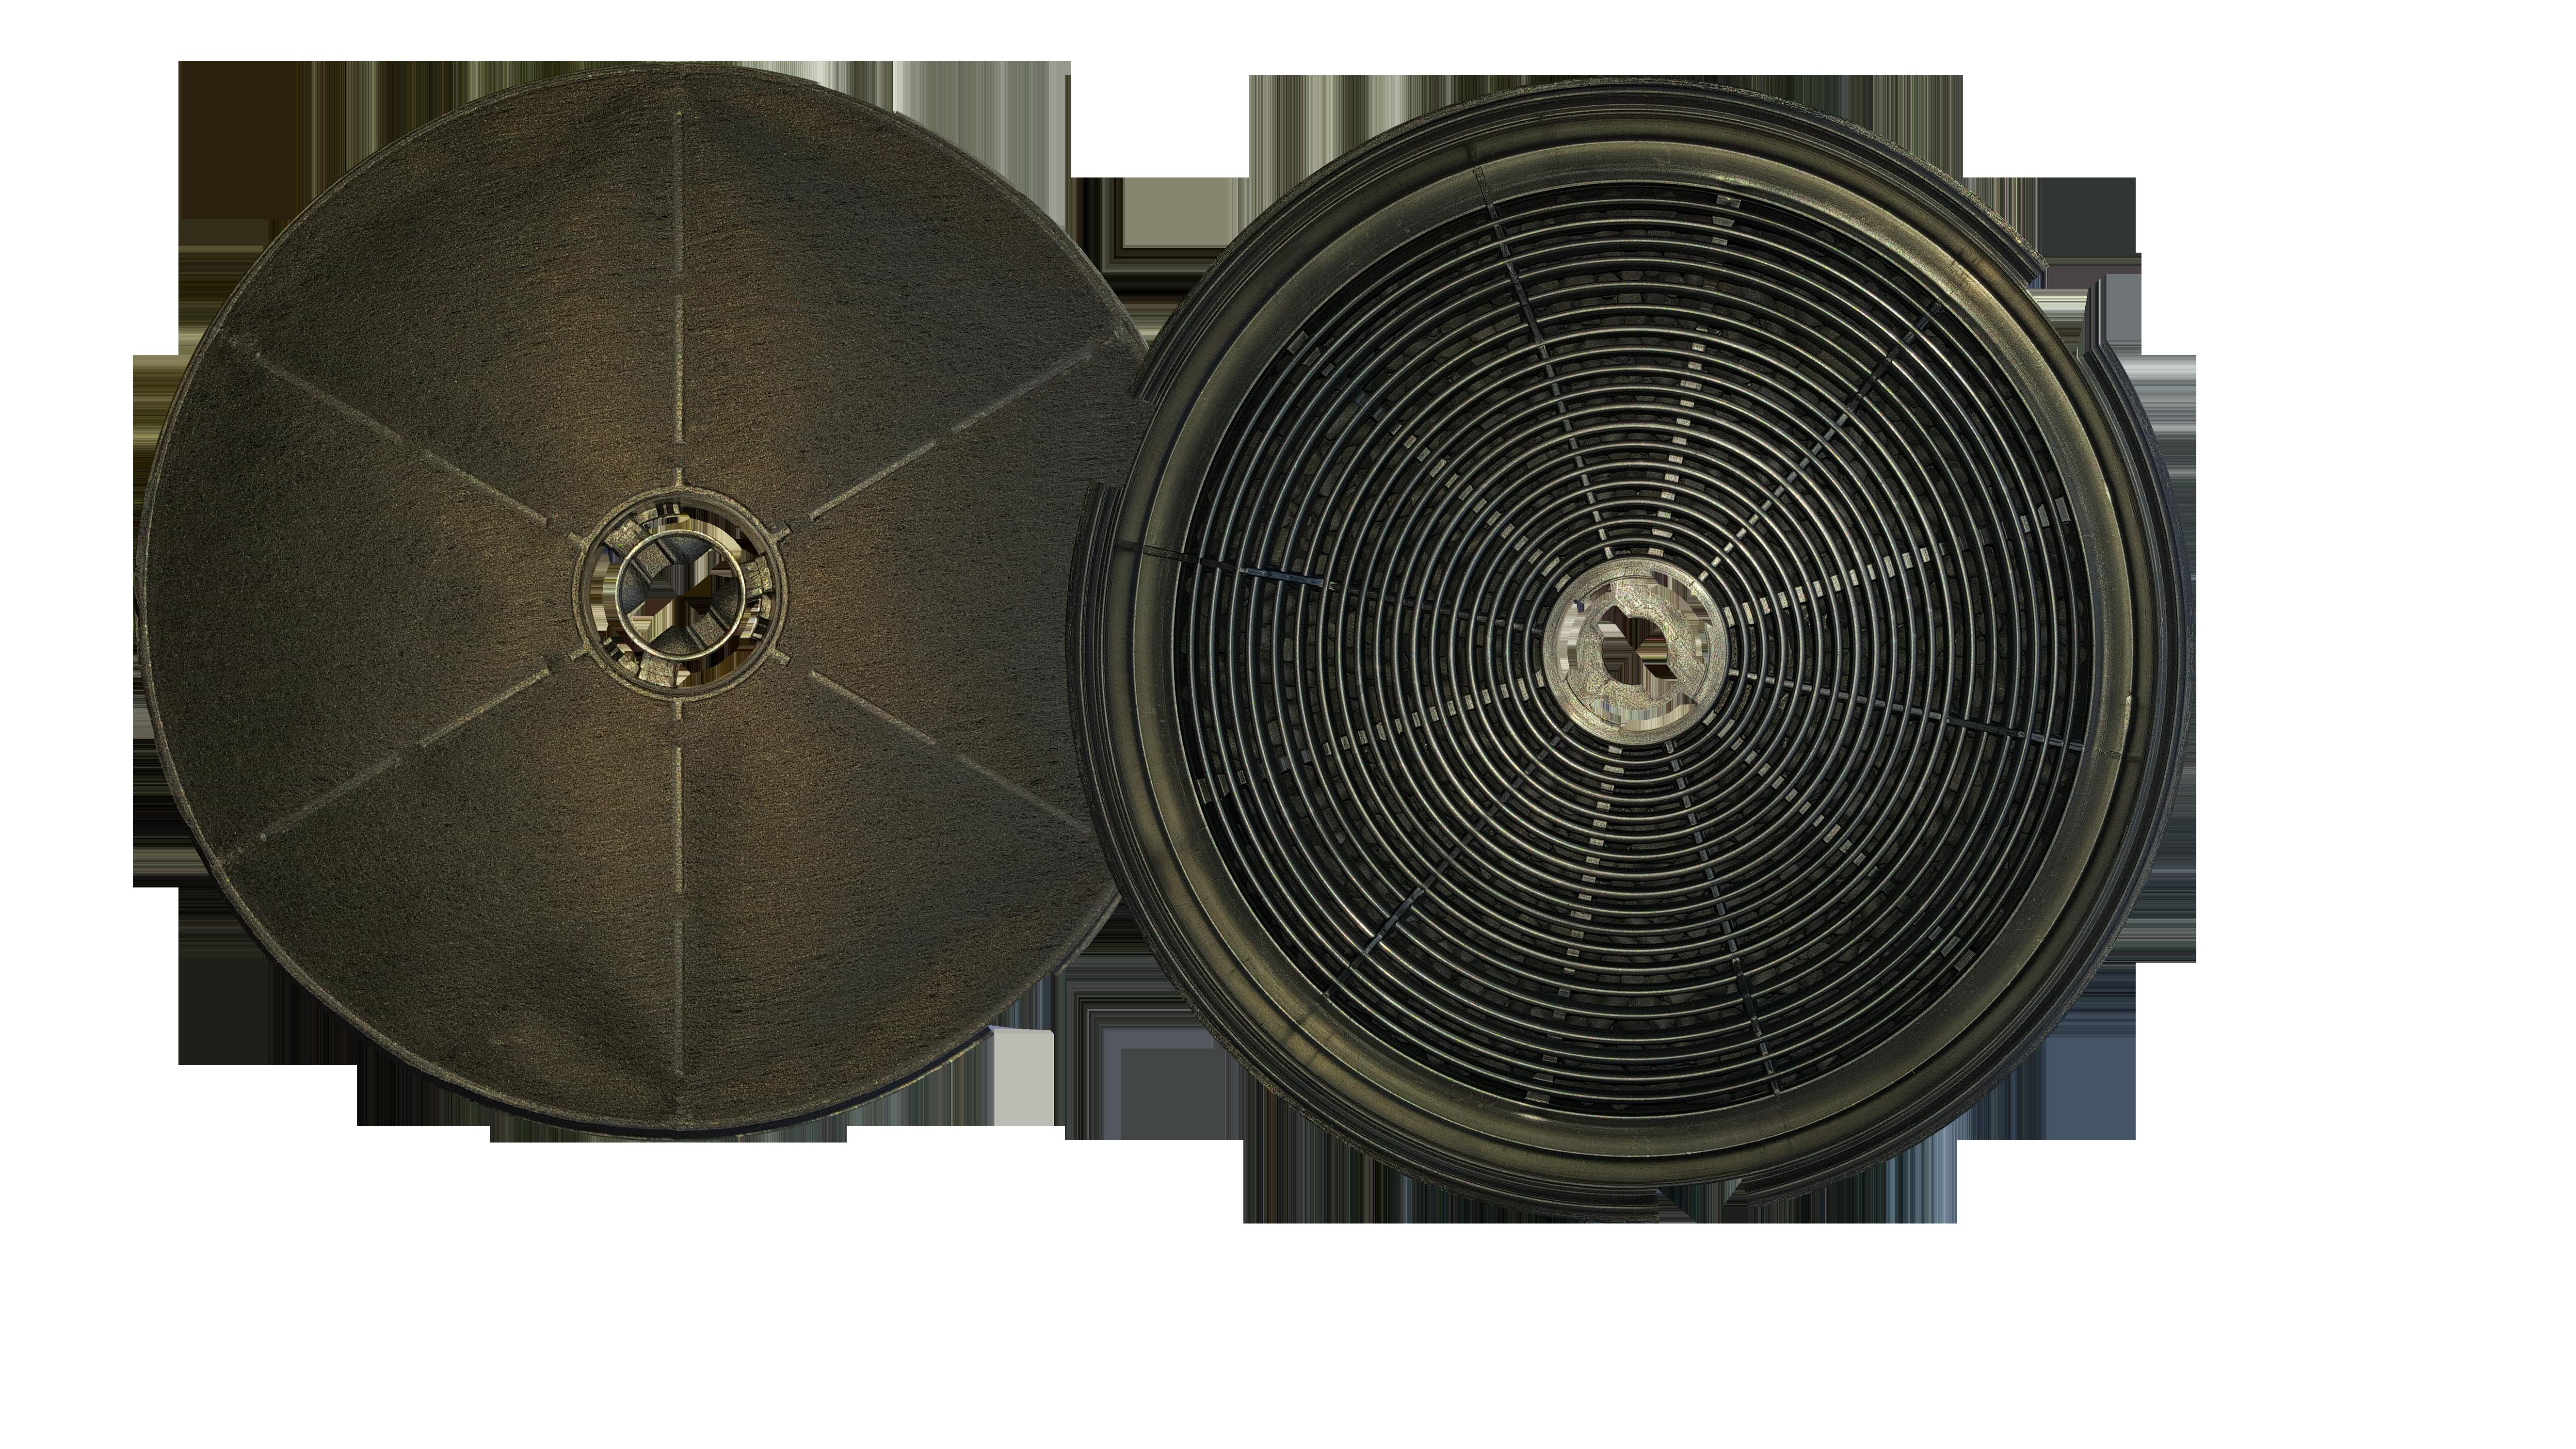 Sparset aktiv kohlefilter filter für dunstabzugshaube honeywell